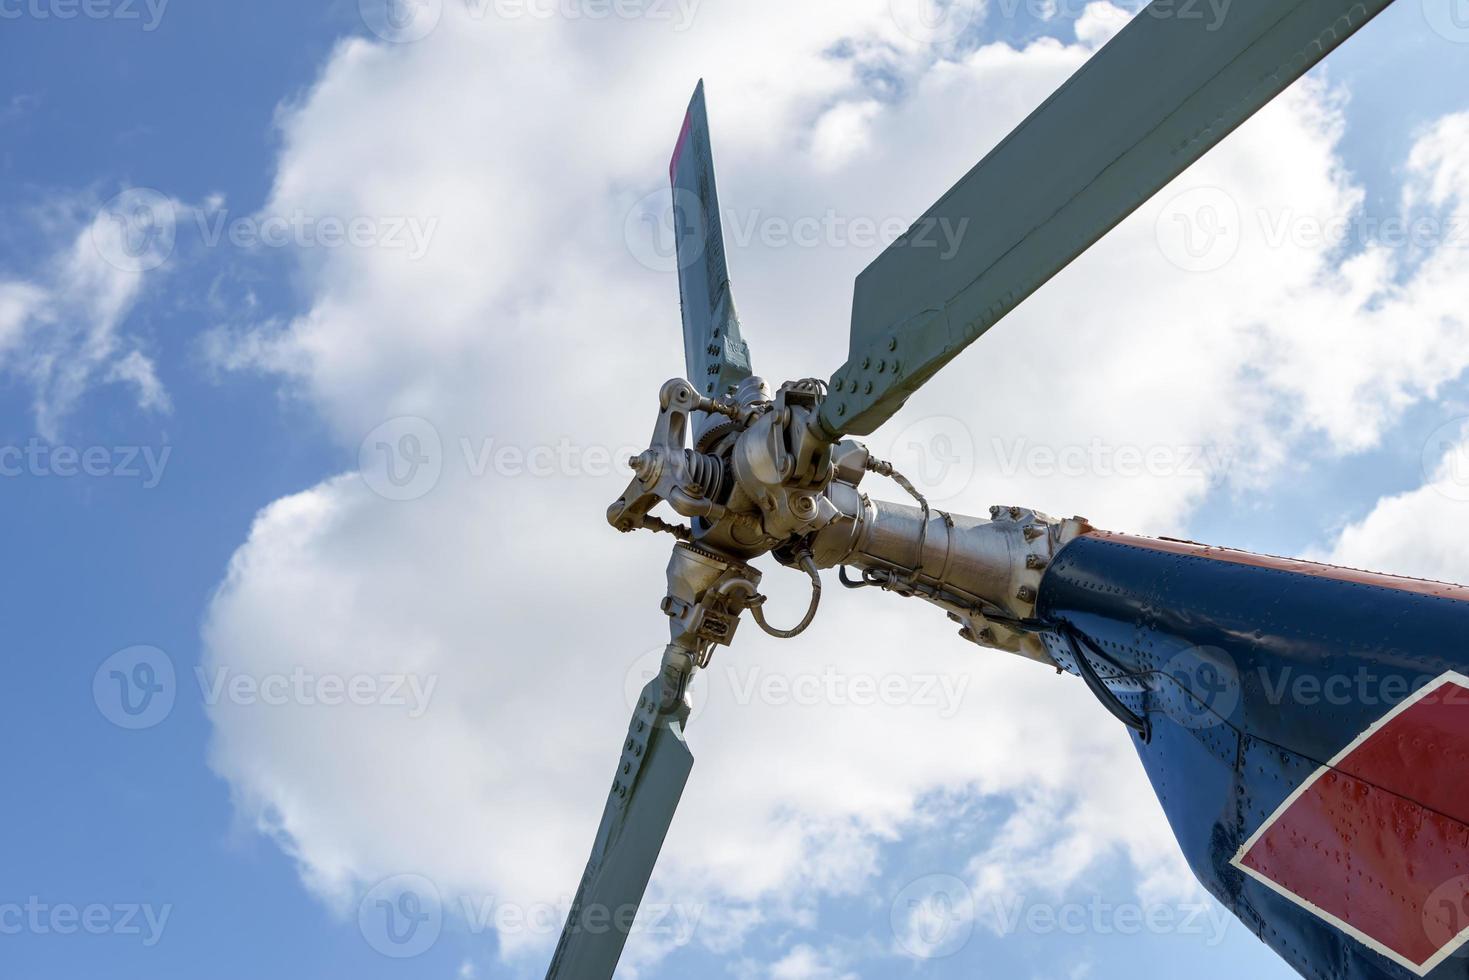 Heckrotor des Hubschraubers foto